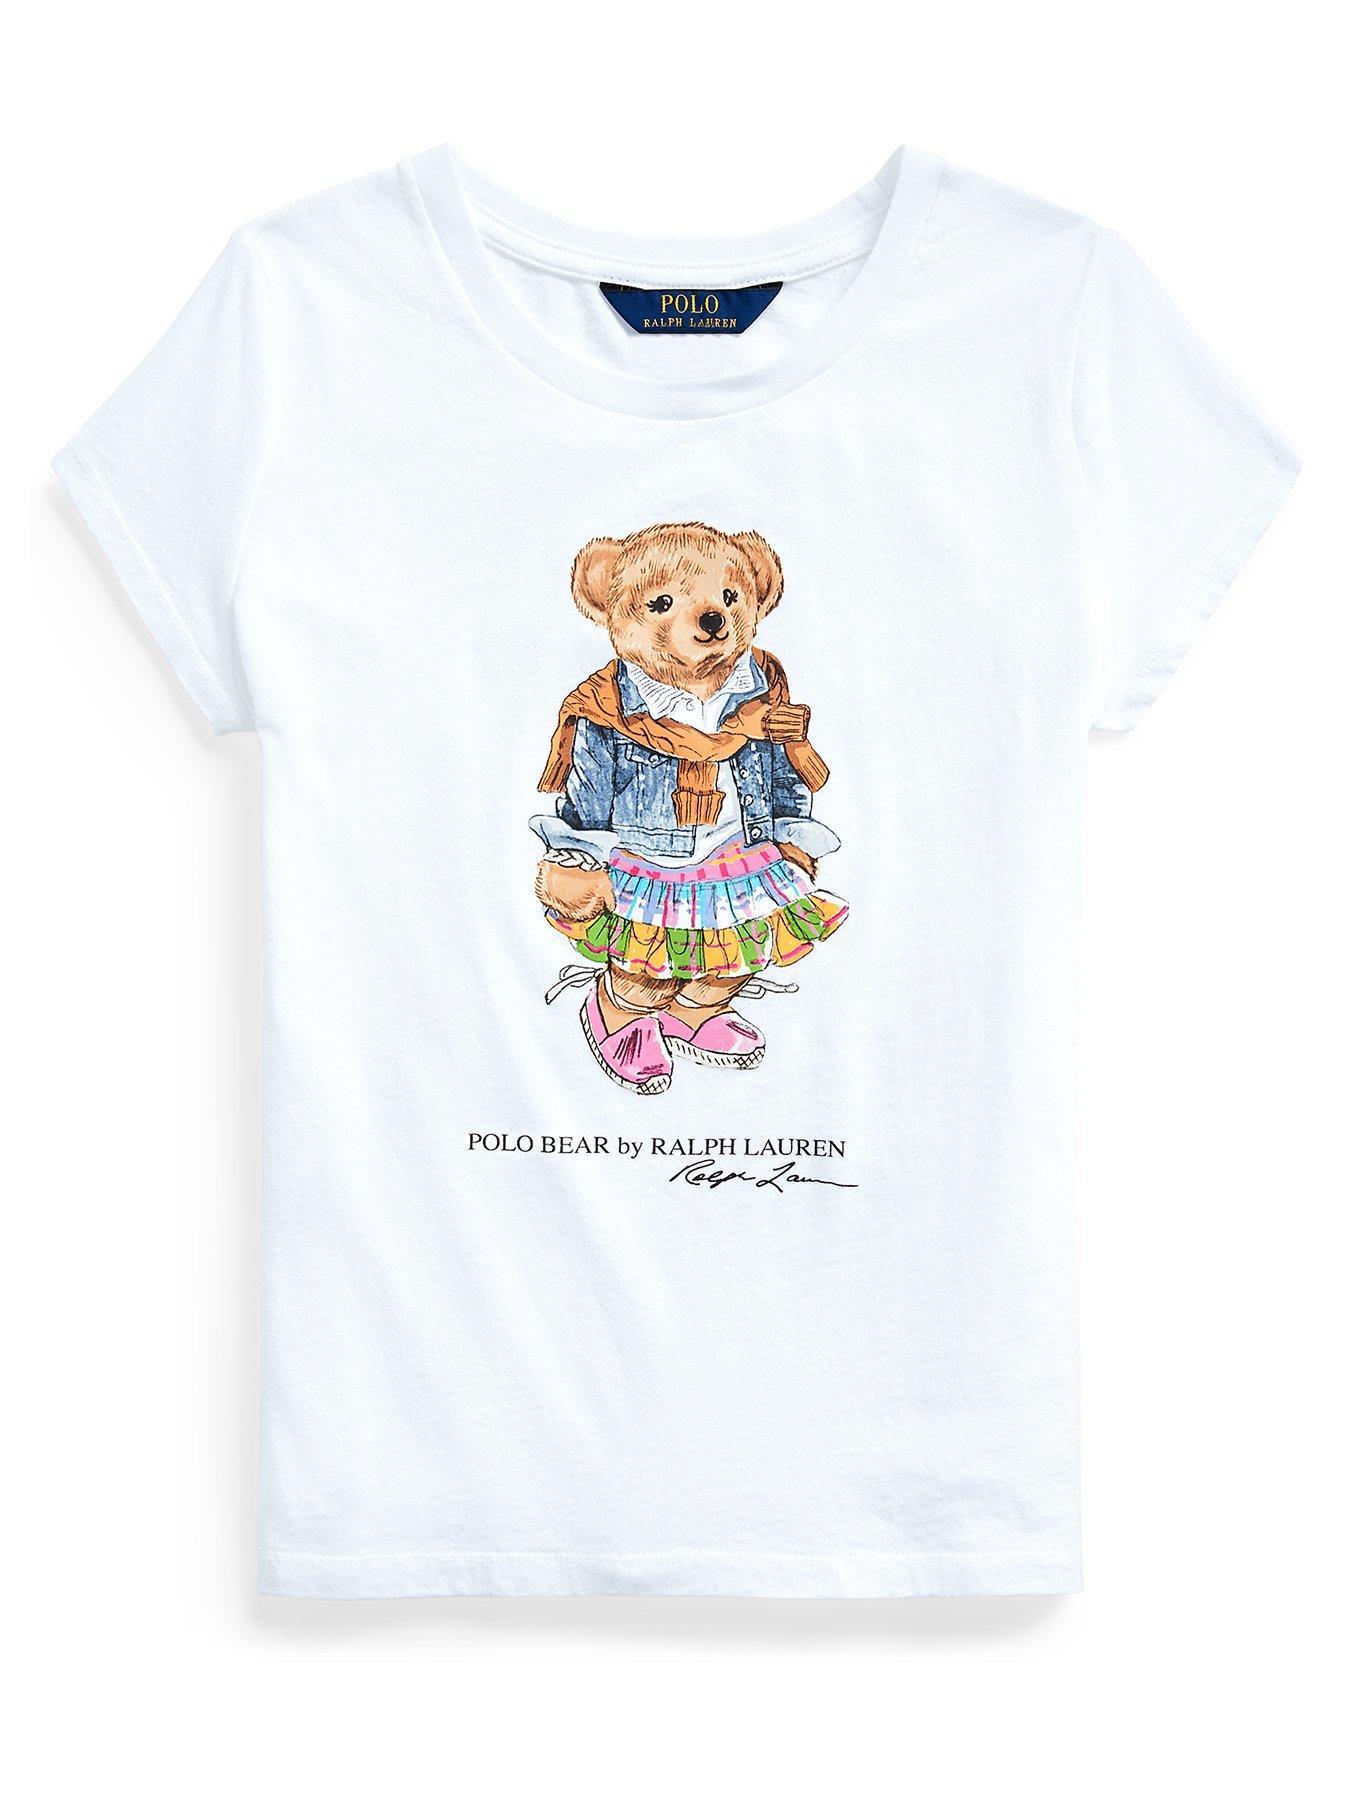 Girls My Little Pony Long Sleeve T Shirt Tee Shirt Pink Crean Ages 2 3 4 5 6 7 8